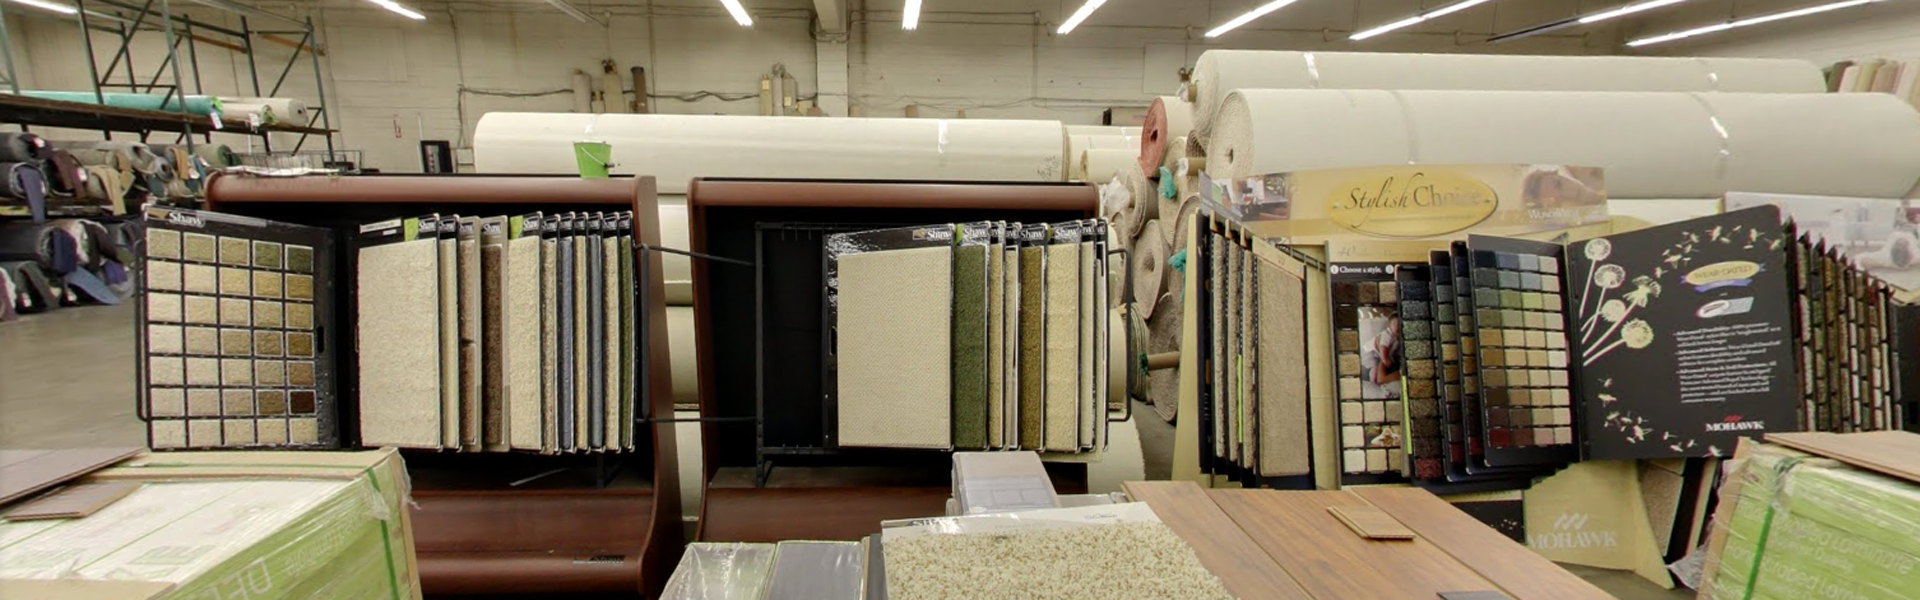 Carpet Depot AZ Discount Carpet And Flooring Warehouse Phoenix AZ - Closest flooring store